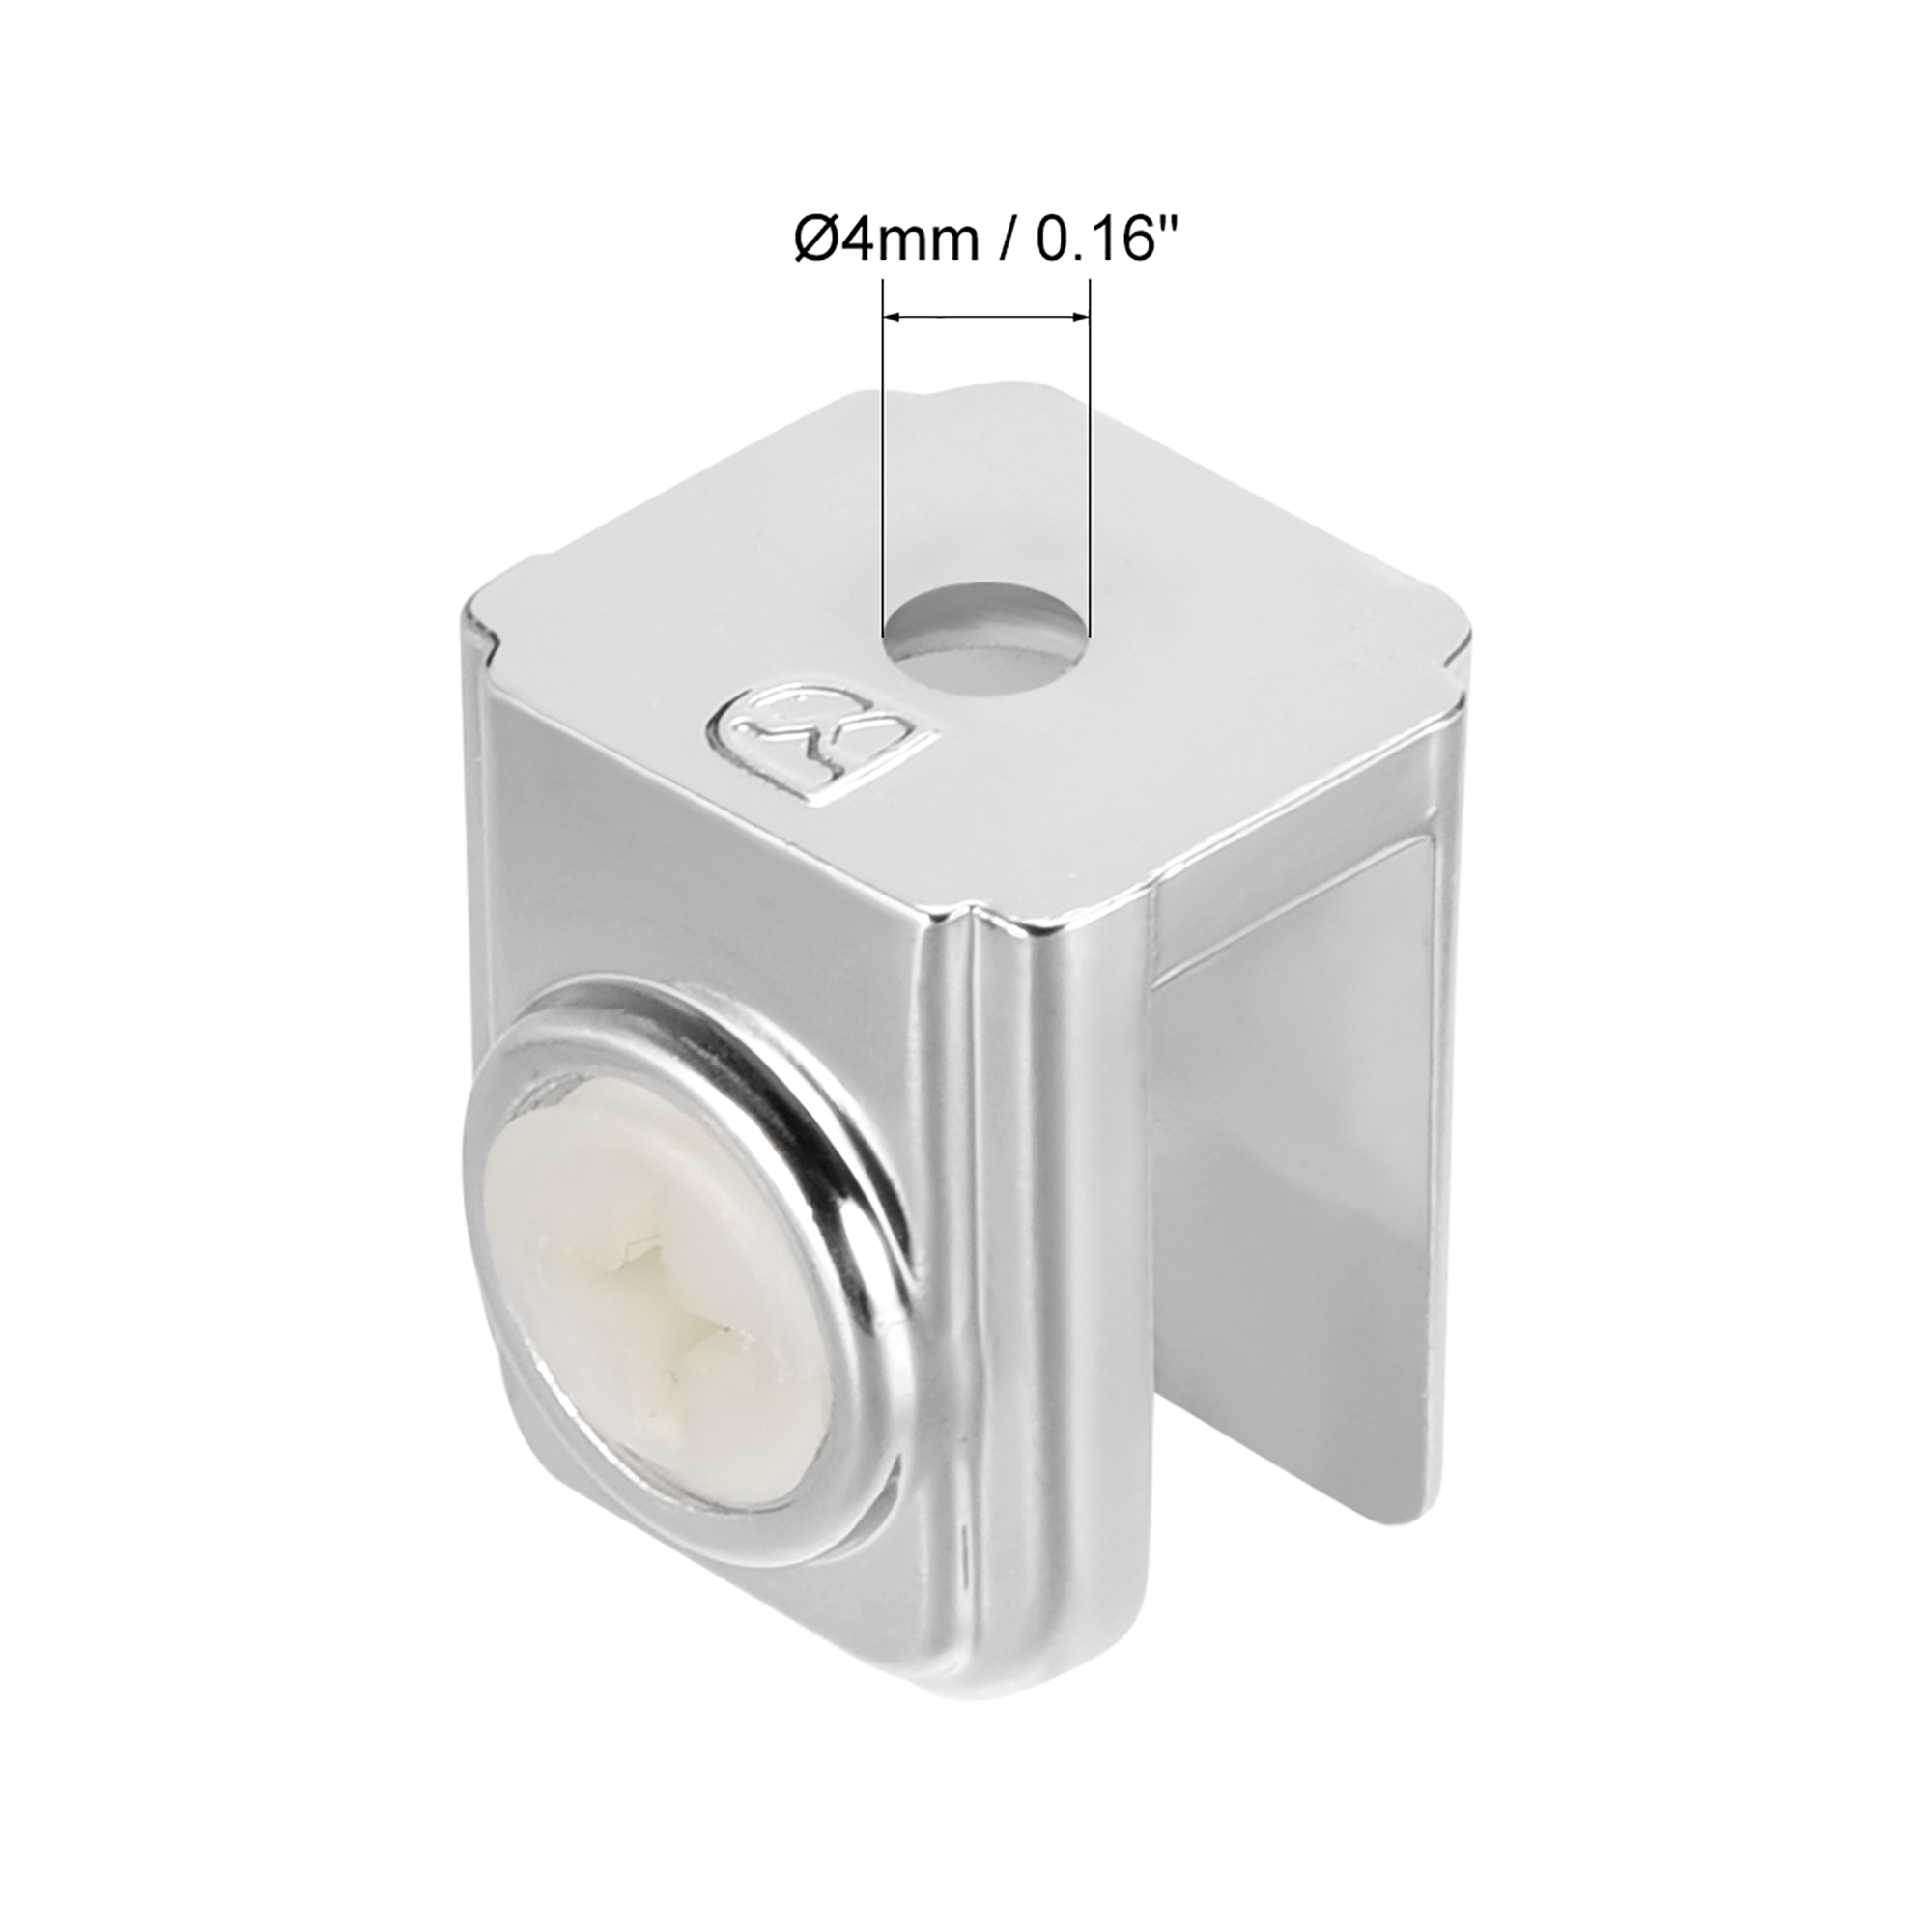 Glass Shelf Brackets - Adjustable Zinc Alloy Glass Clamp Clip Holder for 5-8mm Thick, Type-06, 10 Pcs - image 1 de 4